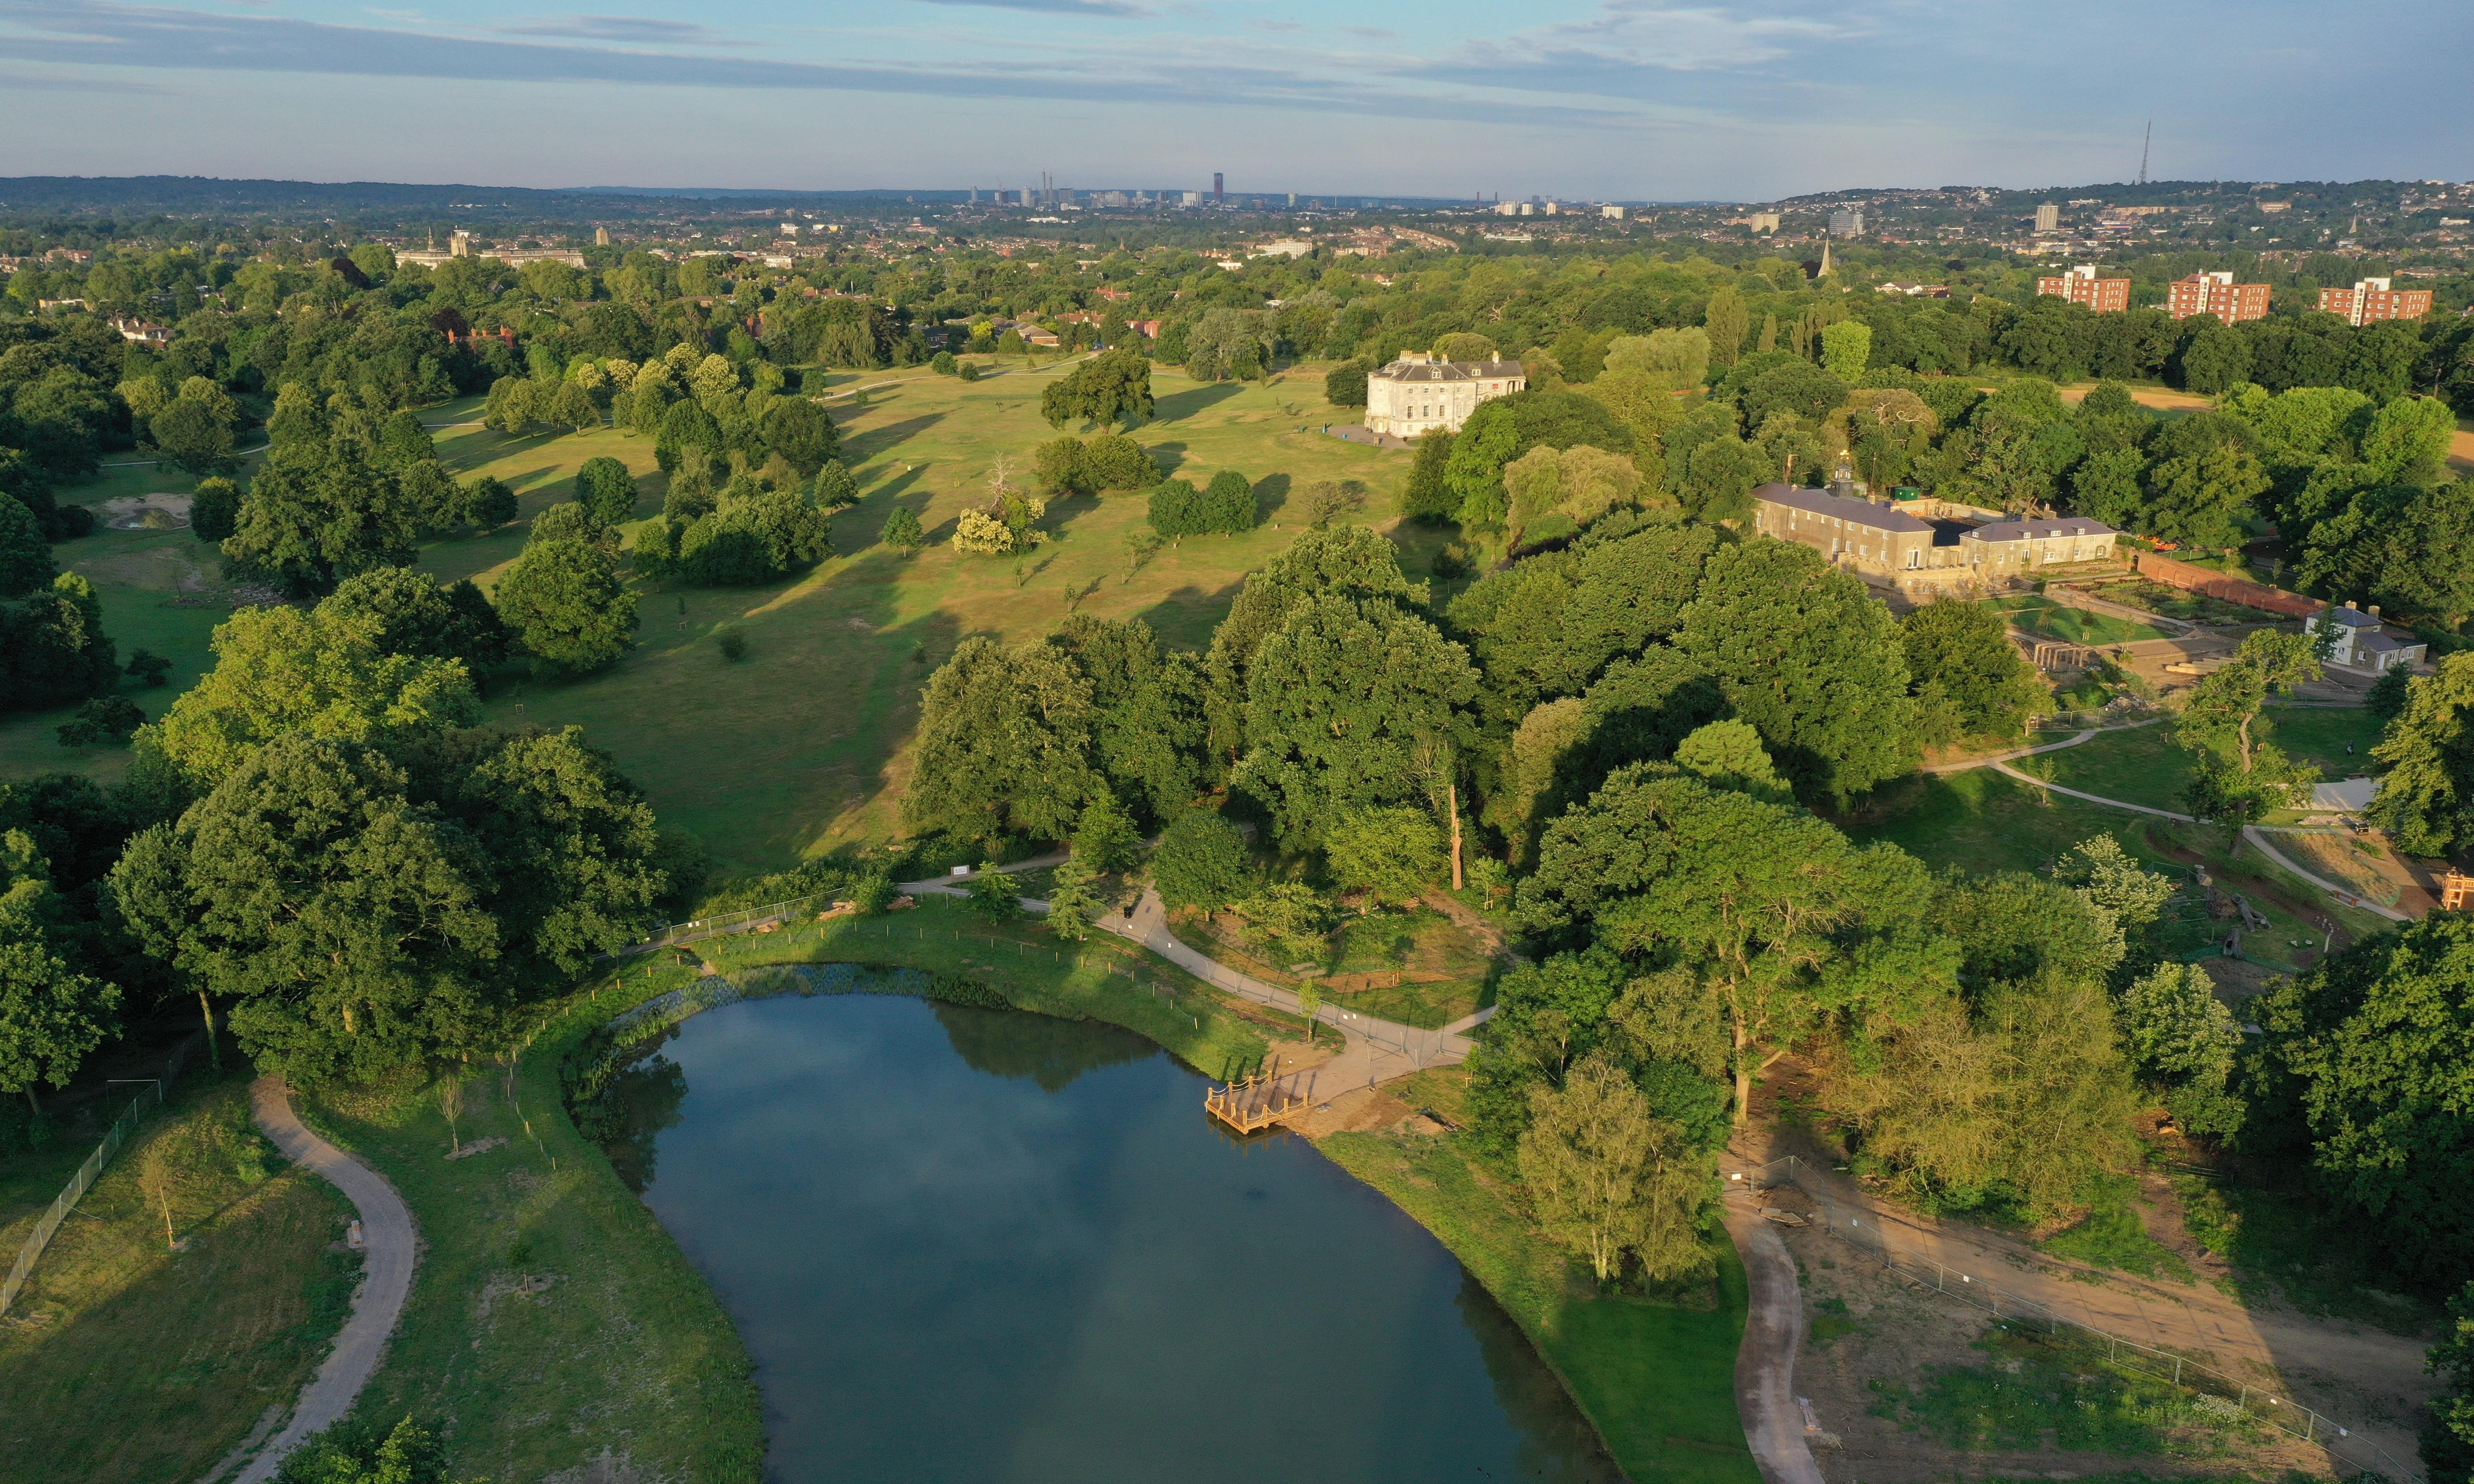 Beckenham Place Park: London's newest green space